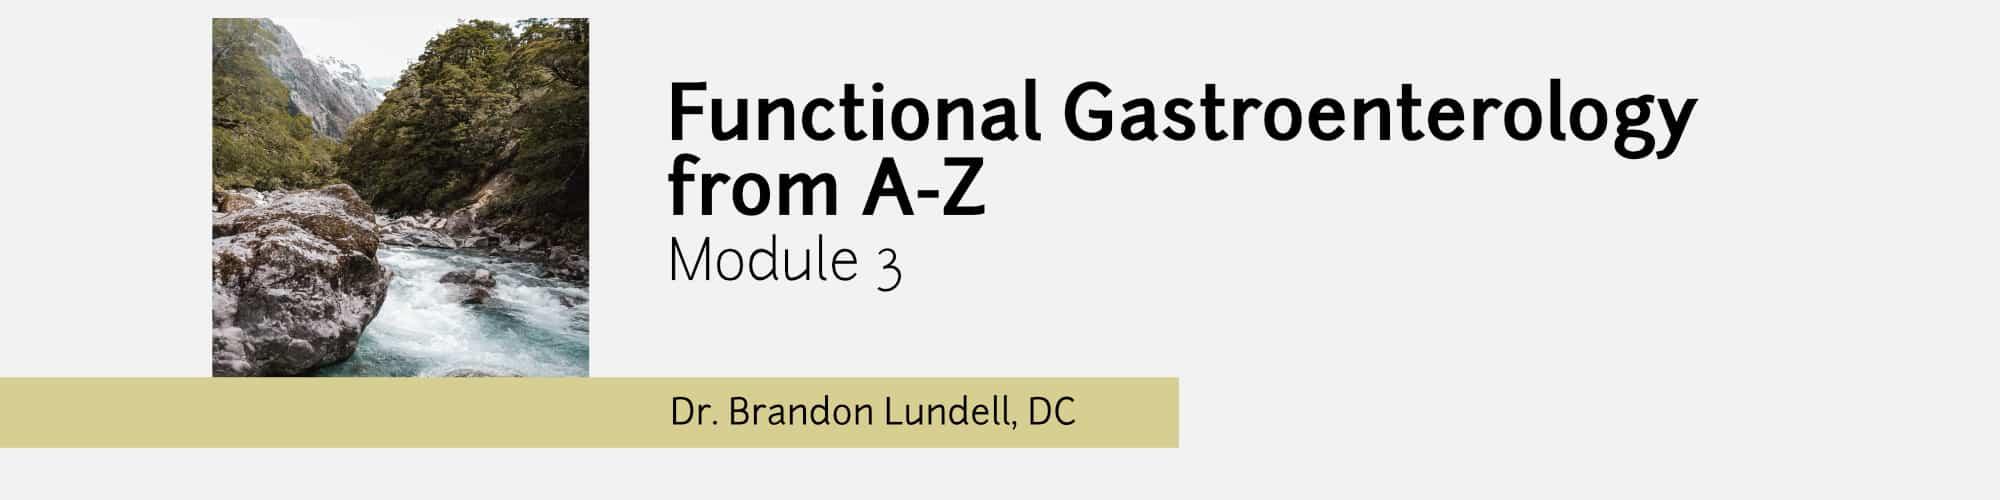 Module 3 - Functional Gastroenterology